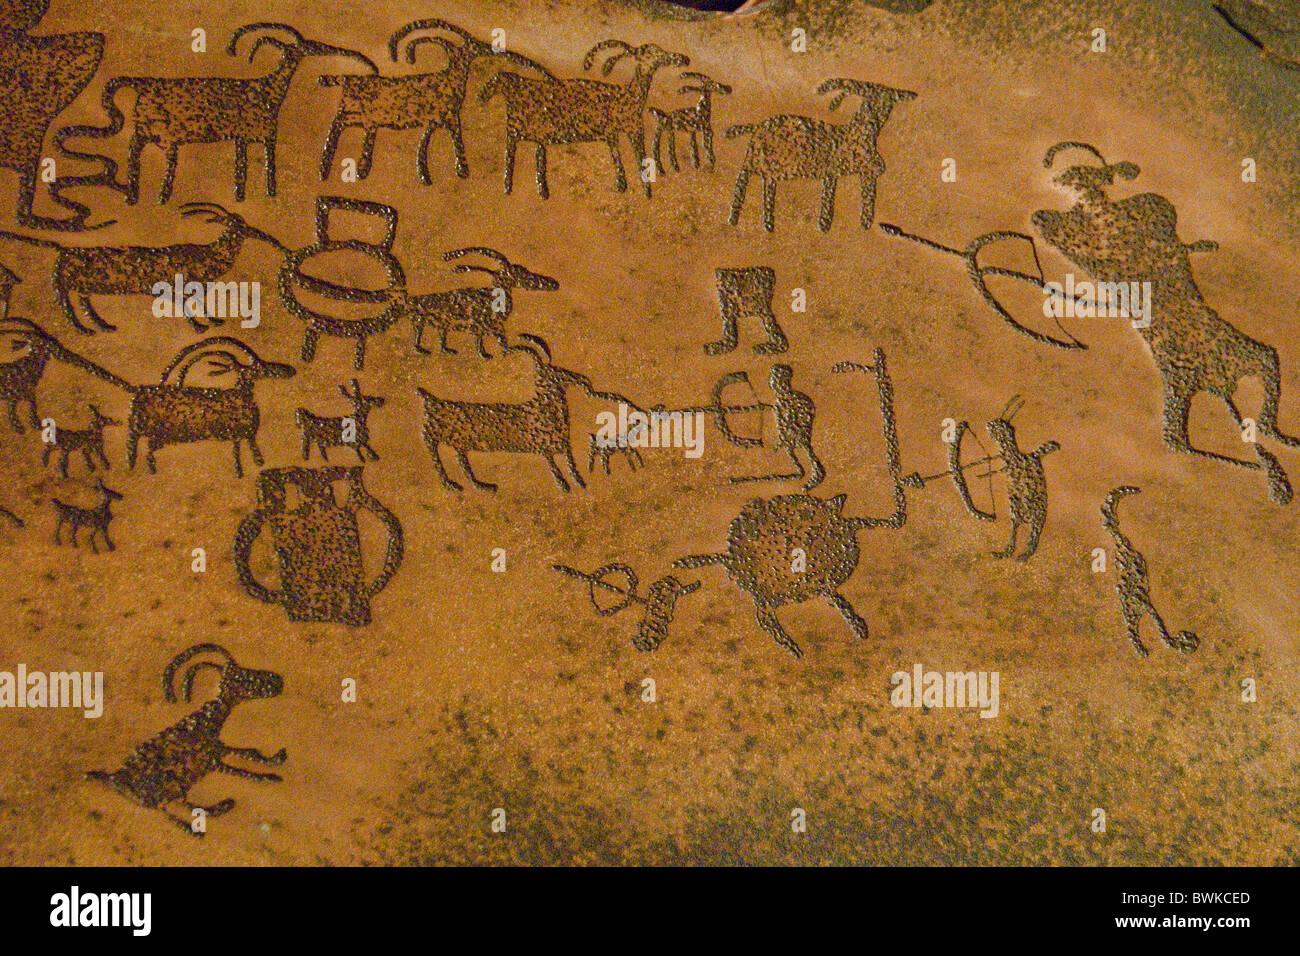 Petroglyphen rock paintings symbols natives simulation replica stock petroglyphen rock paintings symbols natives simulation replica prehistoric museum price utah usa biocorpaavc Image collections